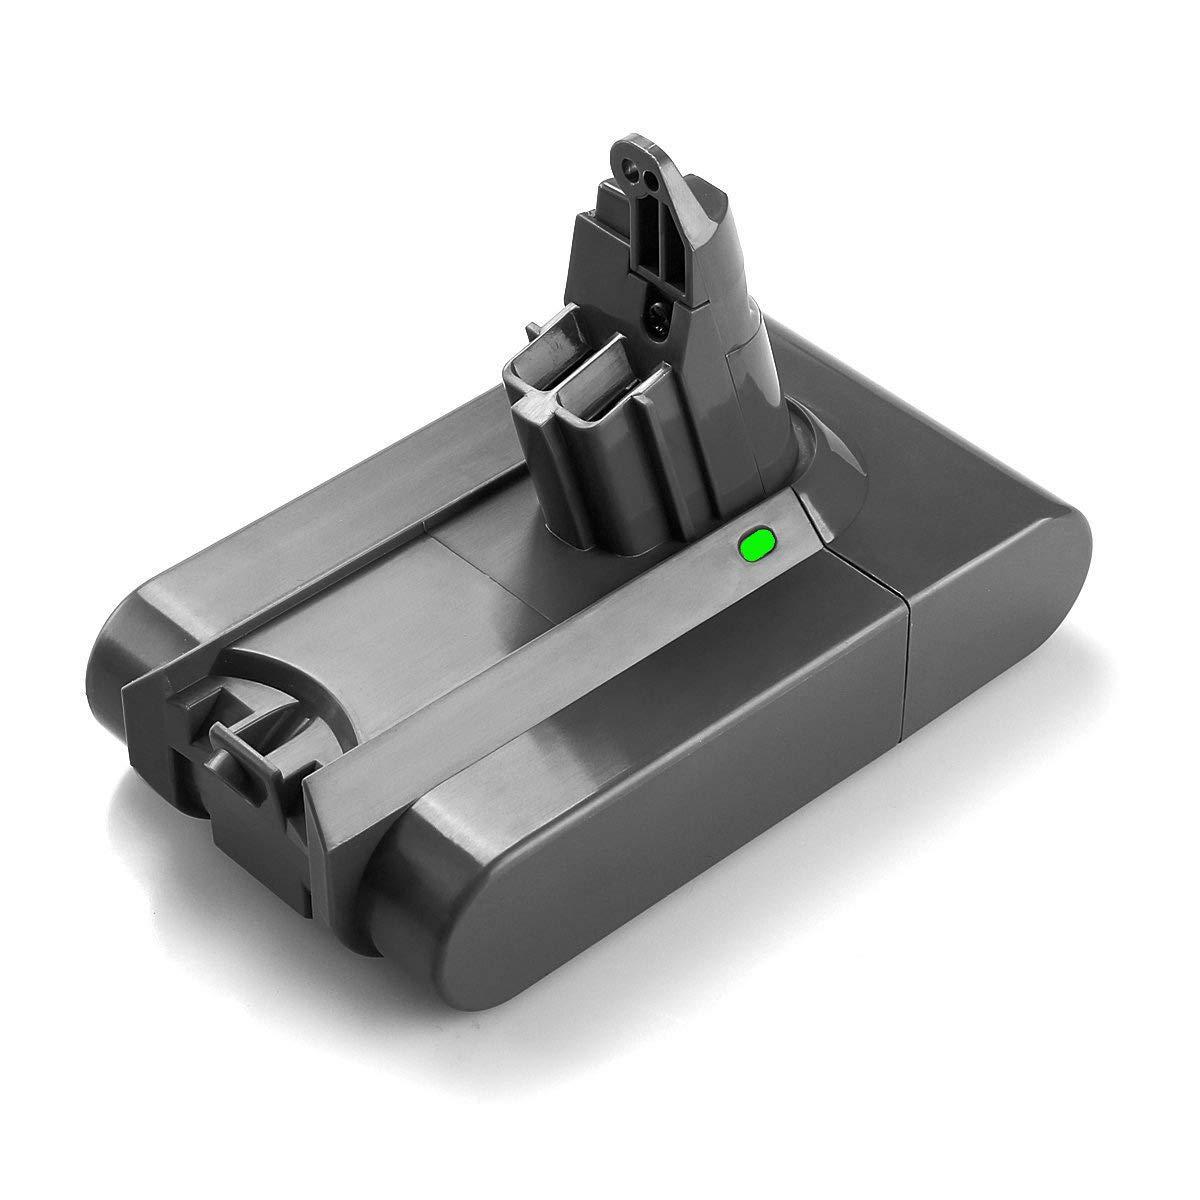 Powerextra 21.6V 2200mAh Replacement Battery for Dyson V6 Dyson DC61 DC62 DC58 DC59 595 650 770 880 Animal DC72 Series Handheld 21.6v Li-ion Battery (Dyson v6 Battery)